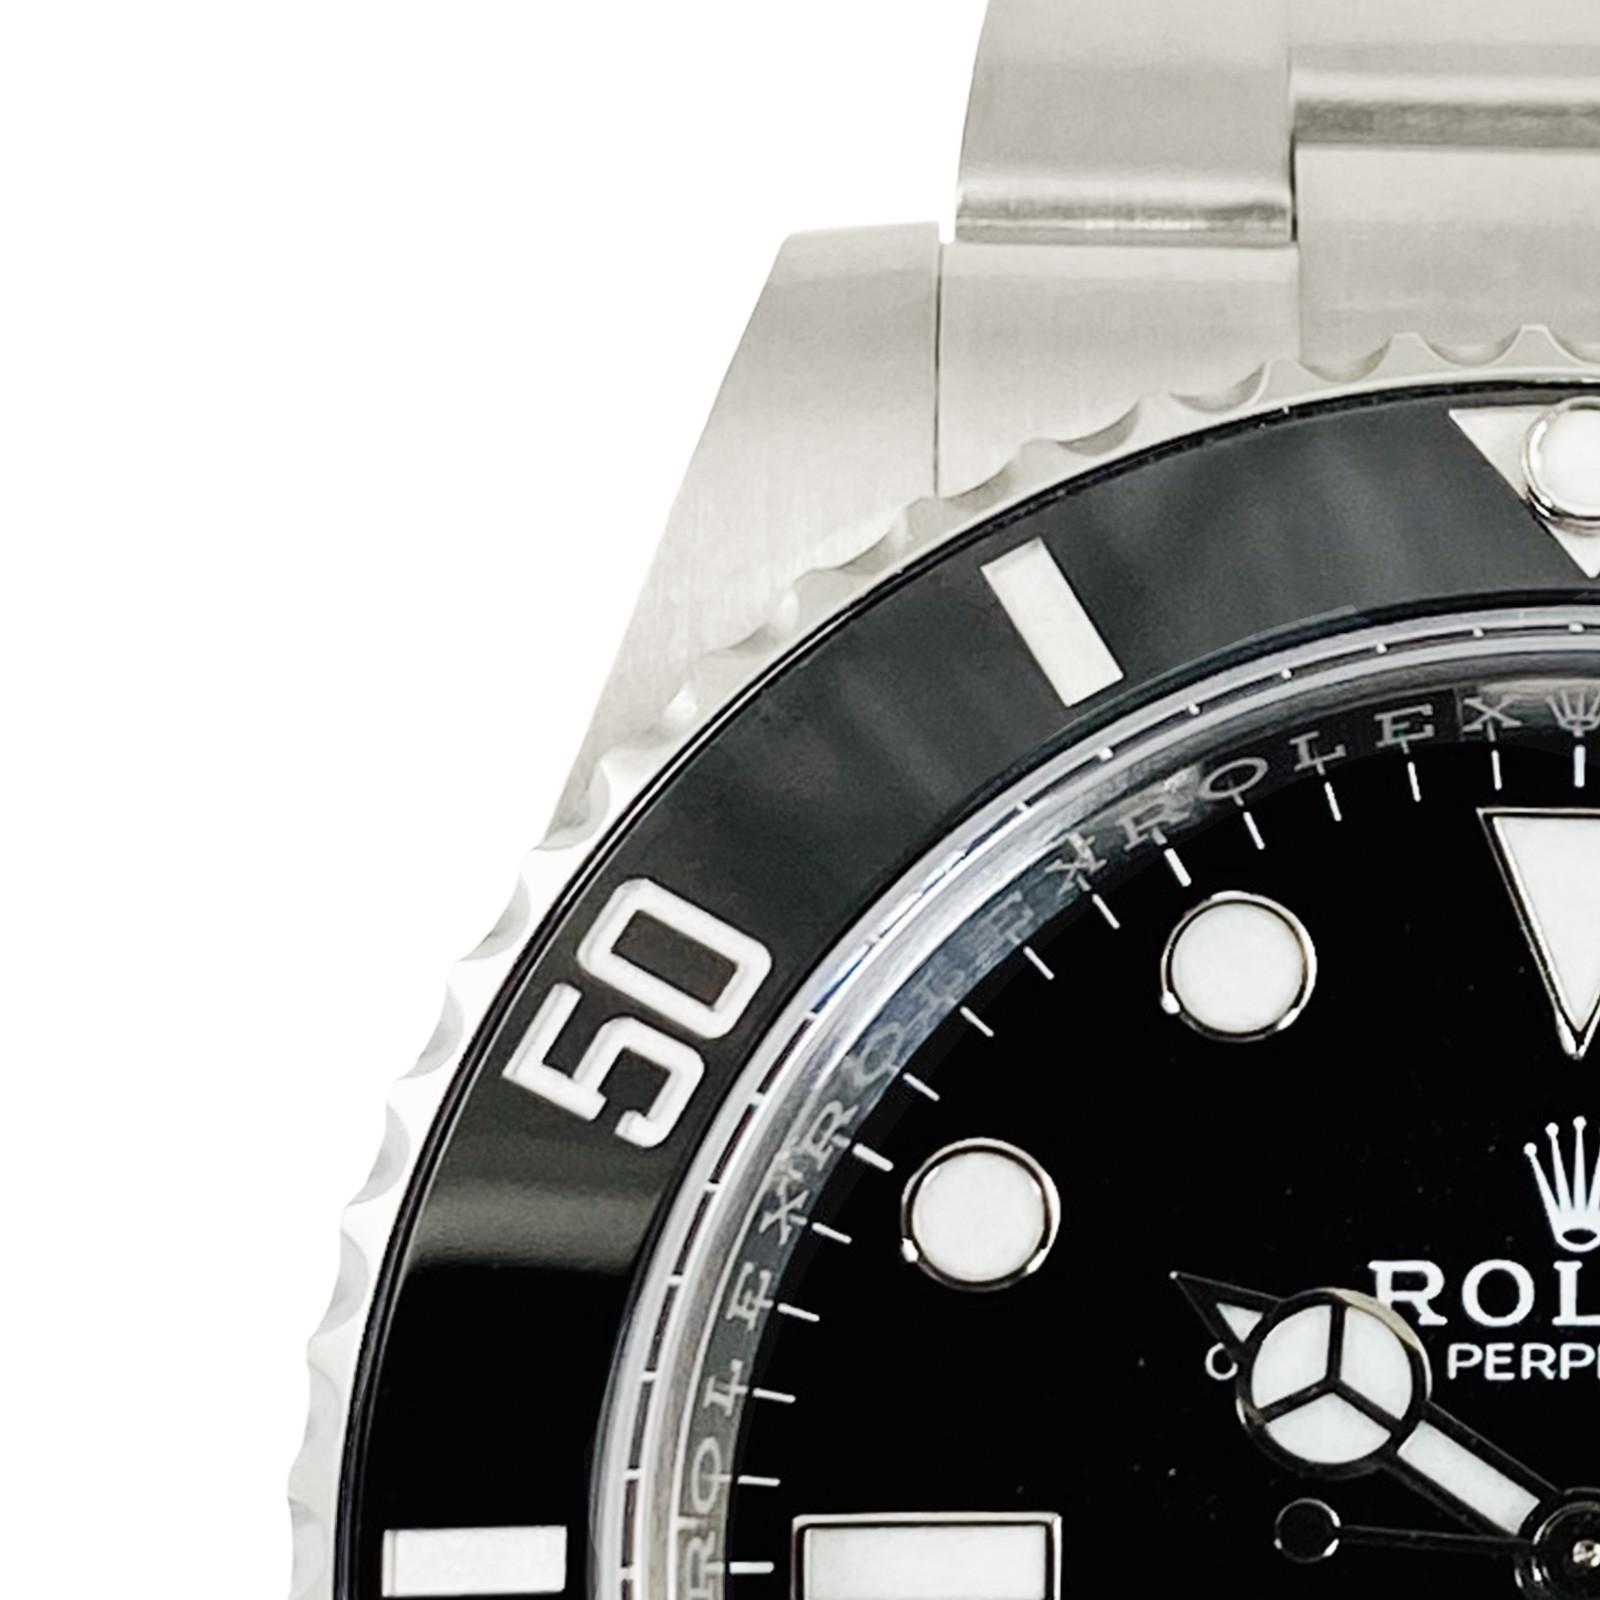 Rolex Submariner 126610 New Model 41 MM